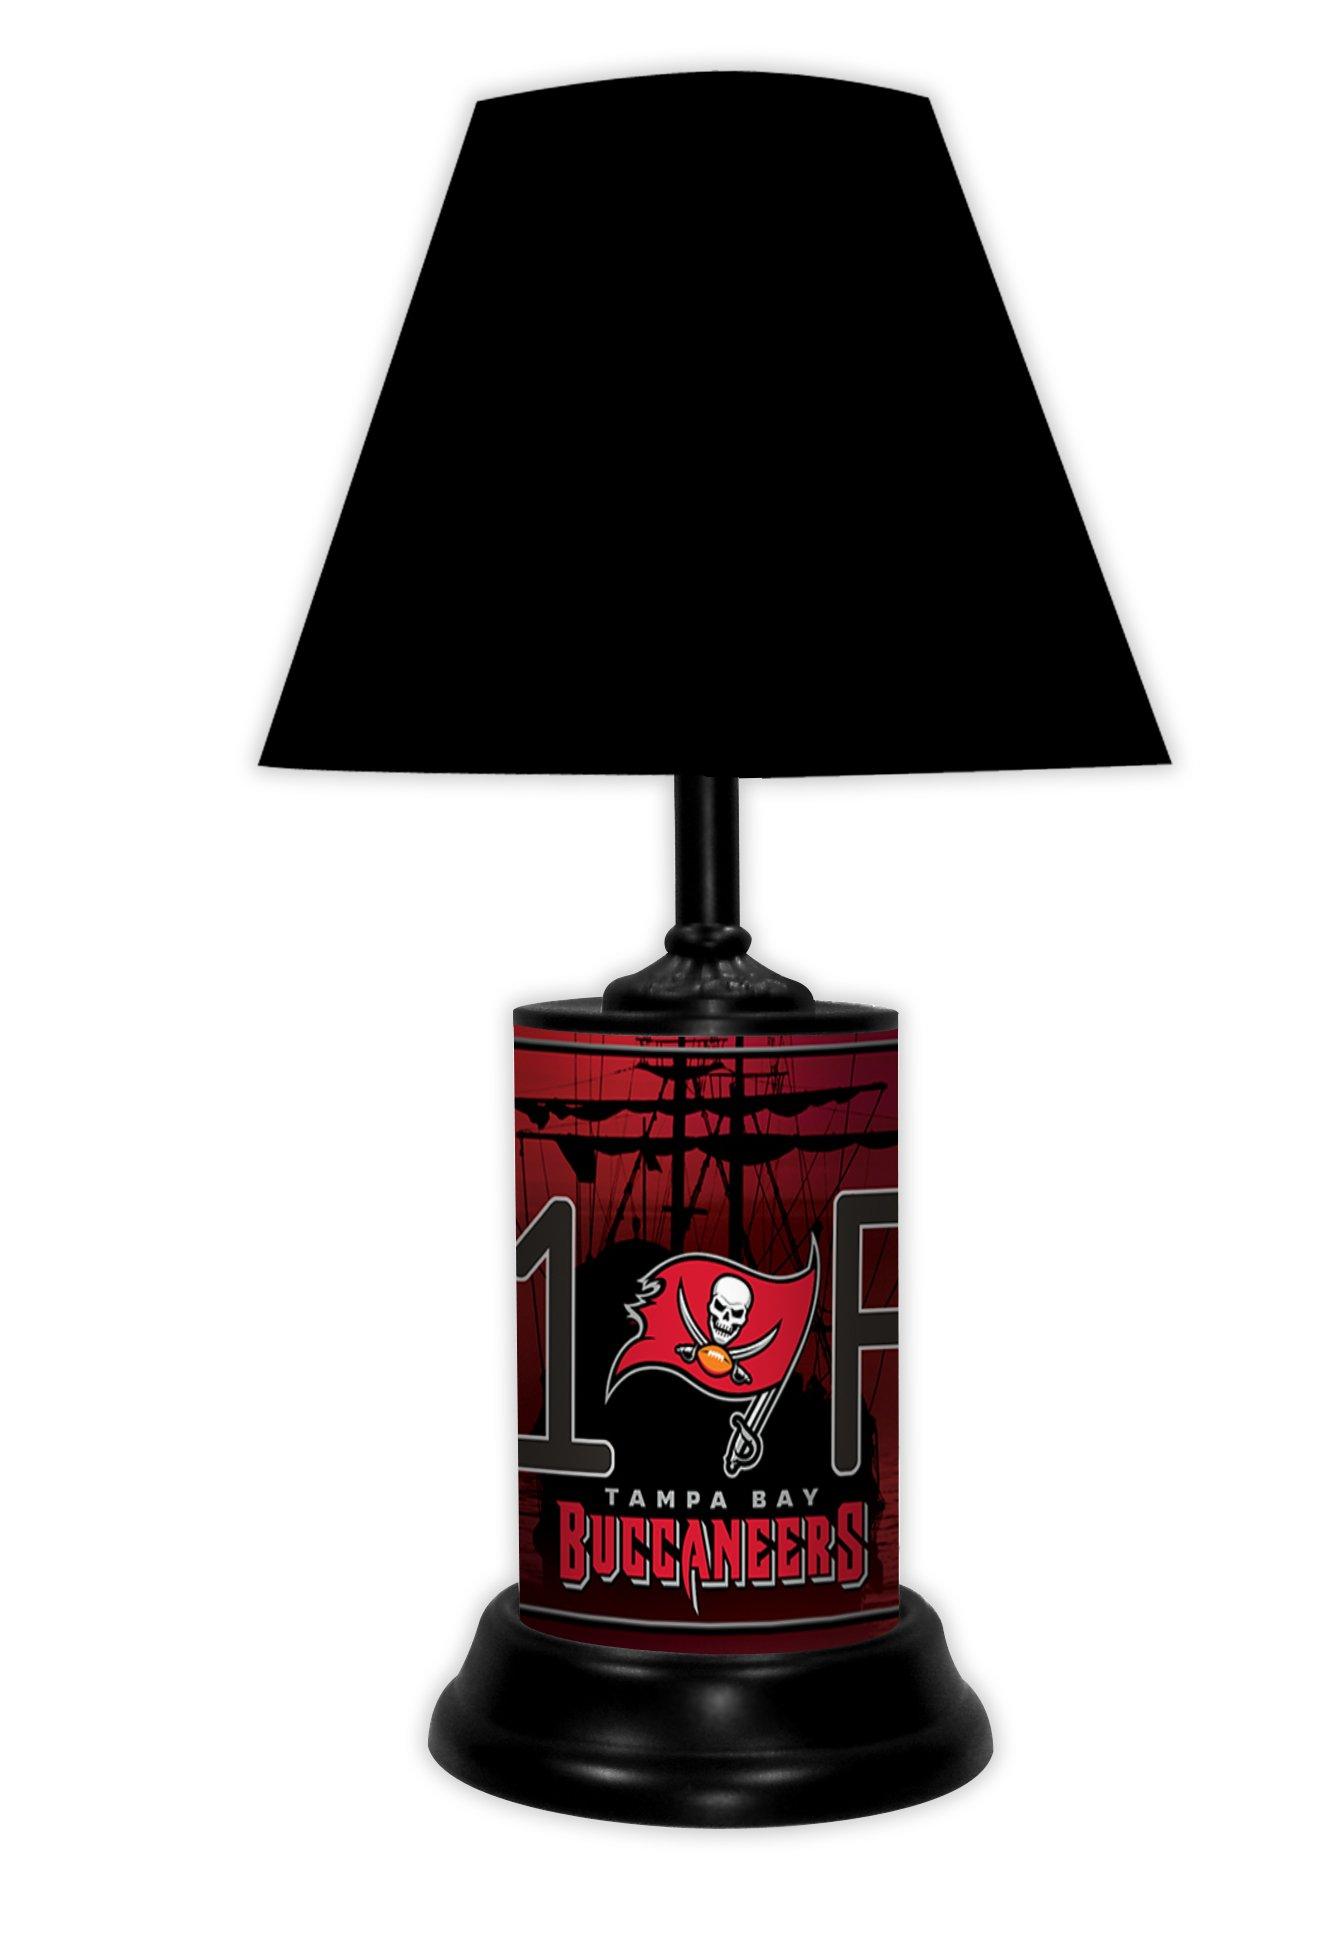 TAMPA BAY BUCCANEERS TABLE LAMP